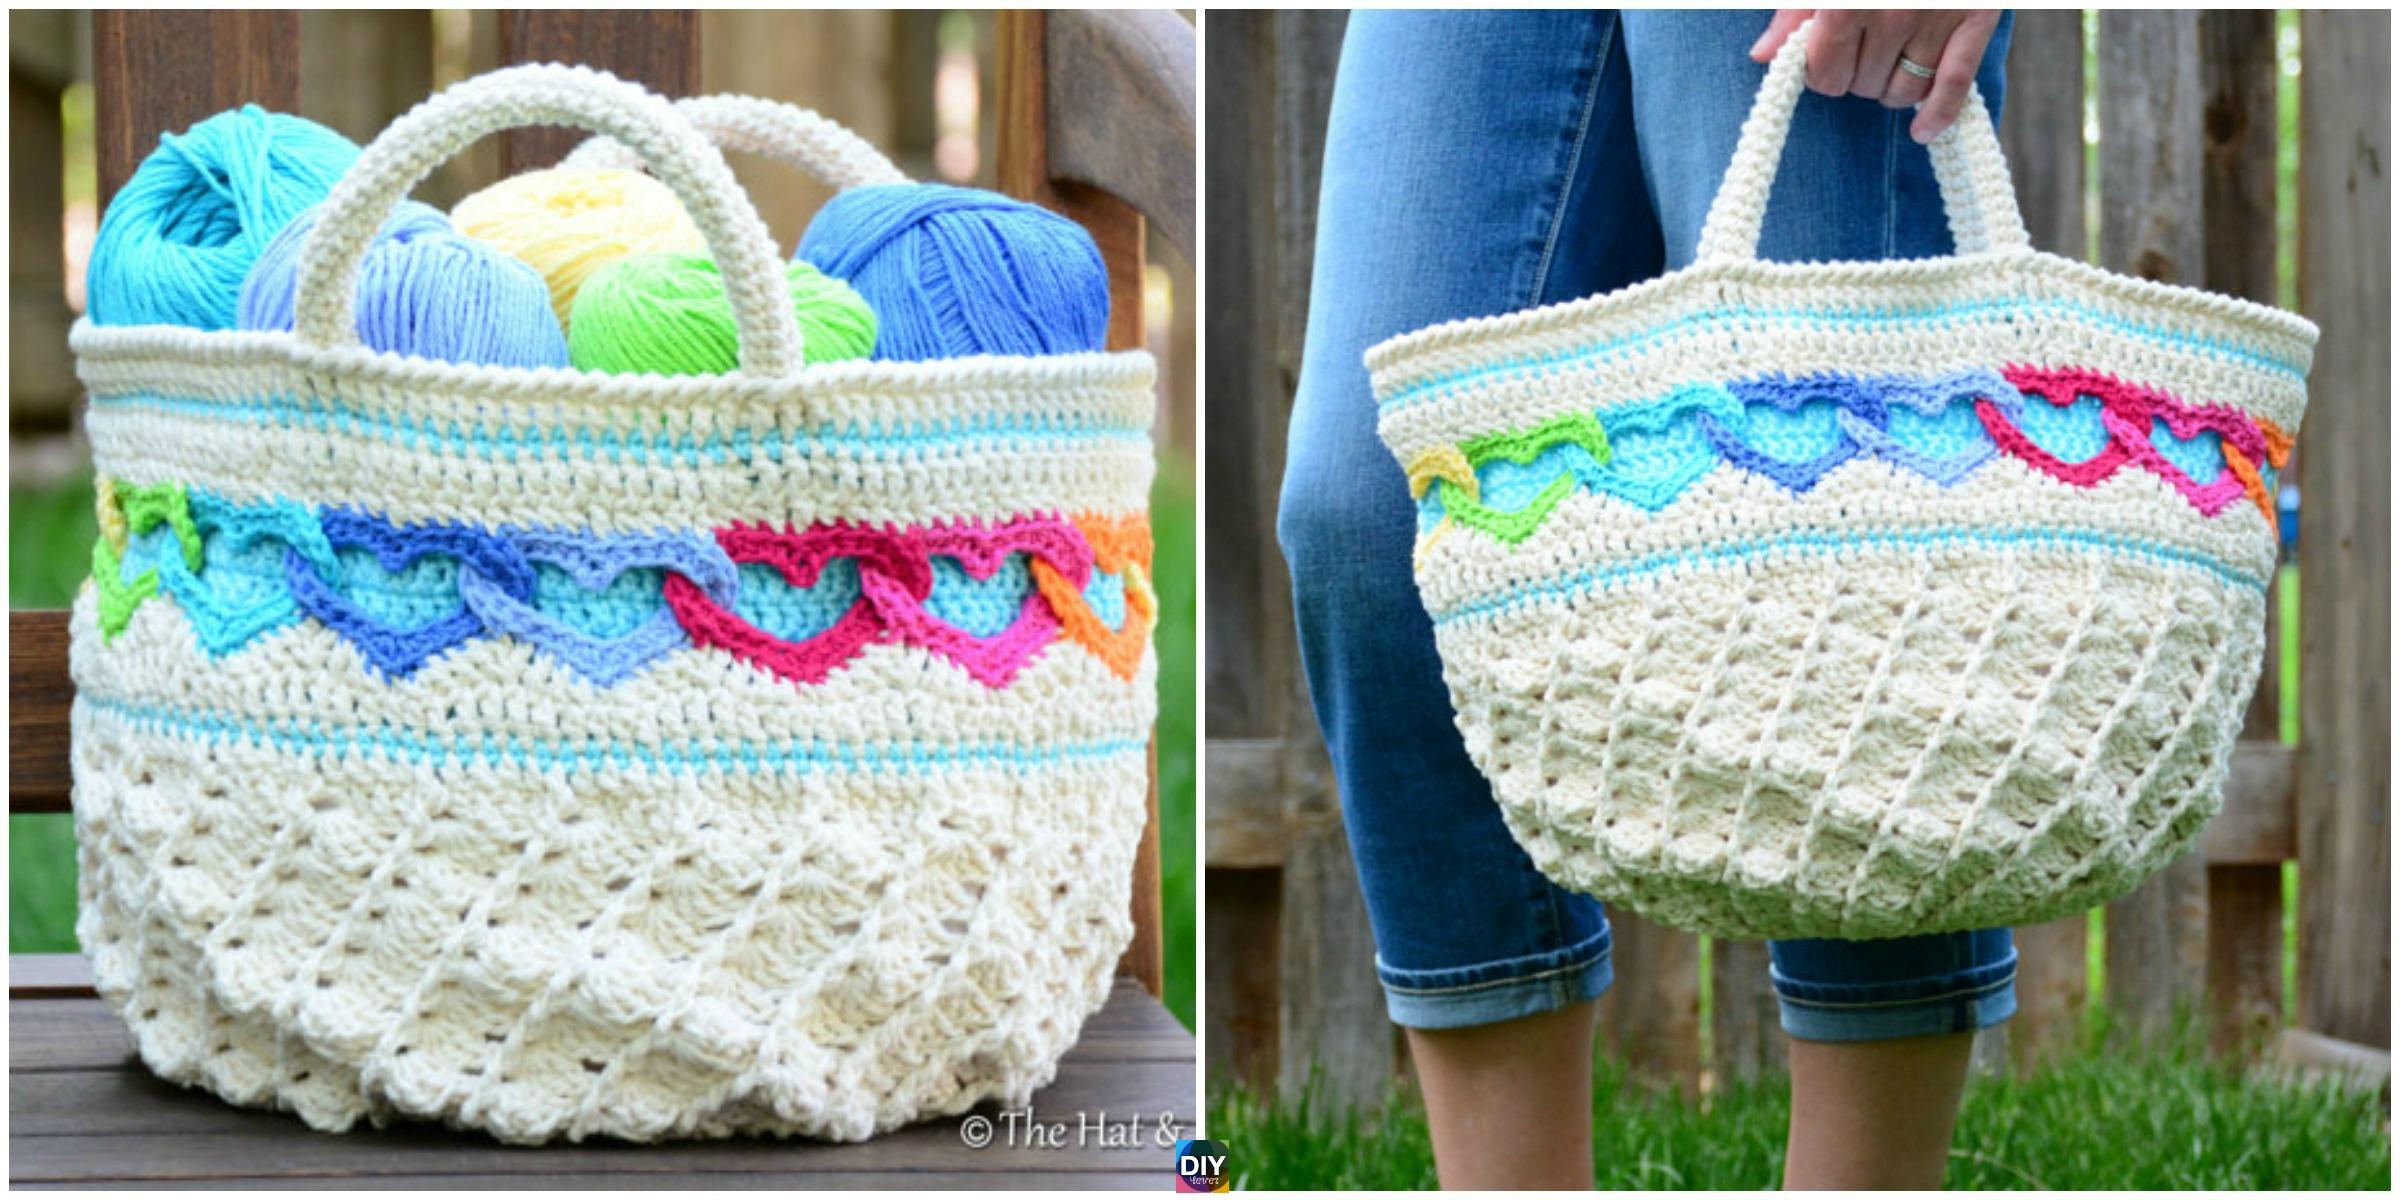 Amazing Crochet Heart Tote Bag Pattern